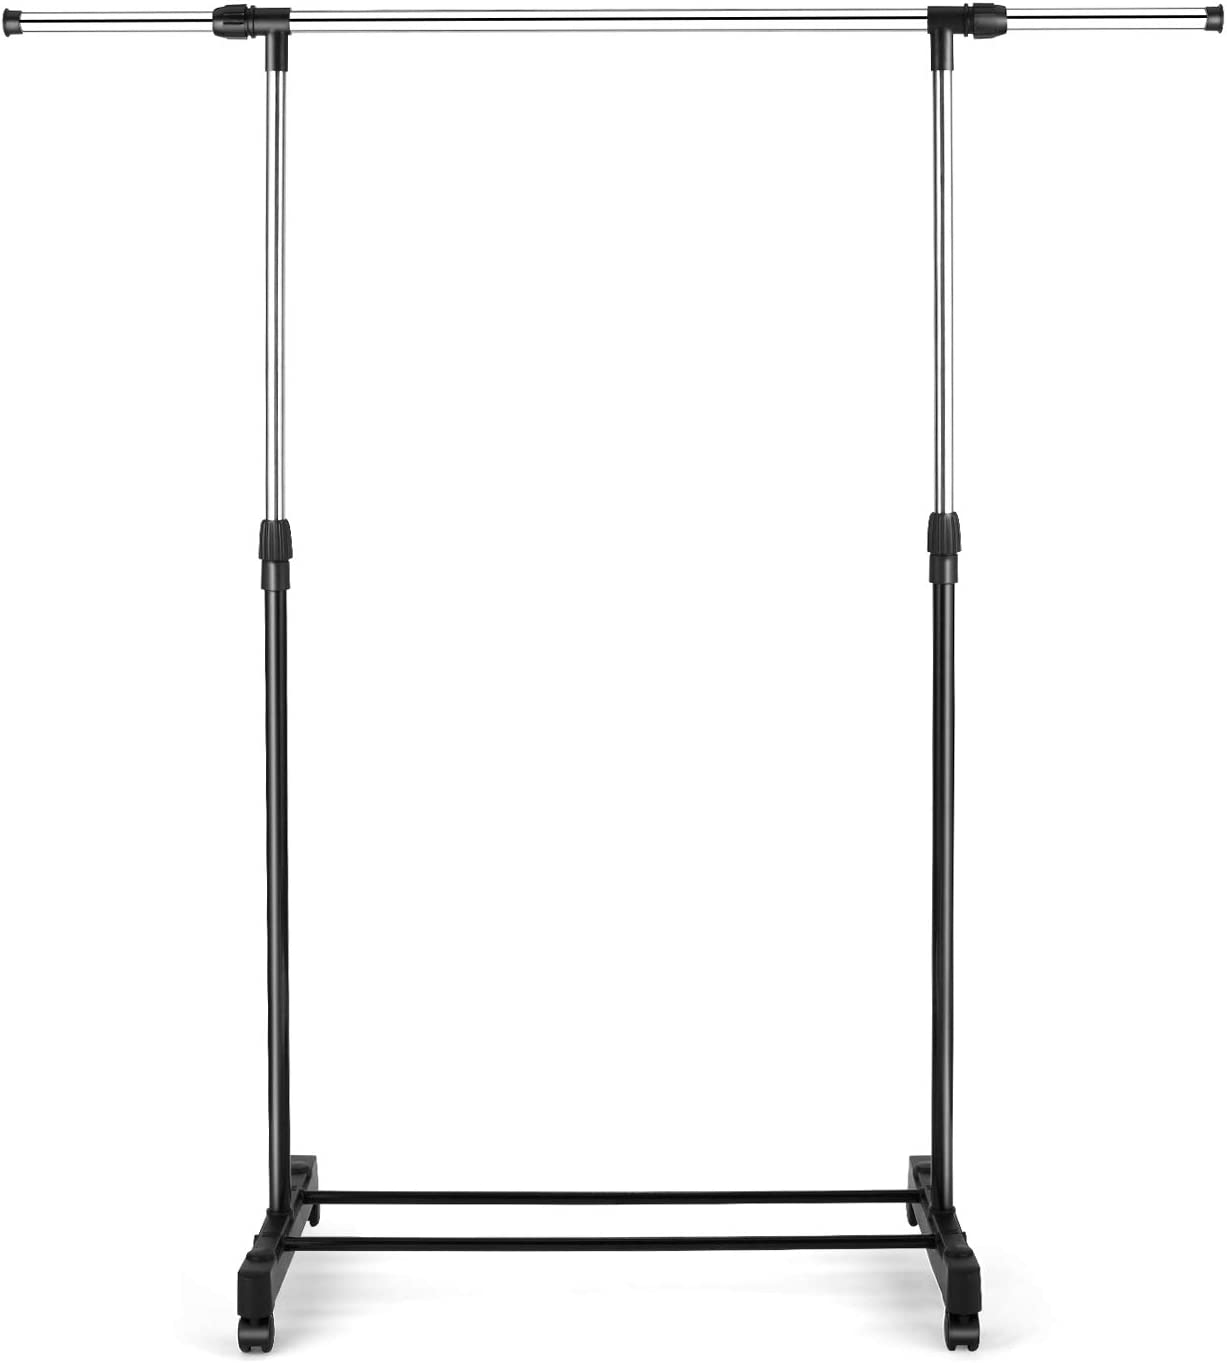 Devo Removable Single Rail Garment Adjustable Sale item Cloth Rack Hanging OFFicial site